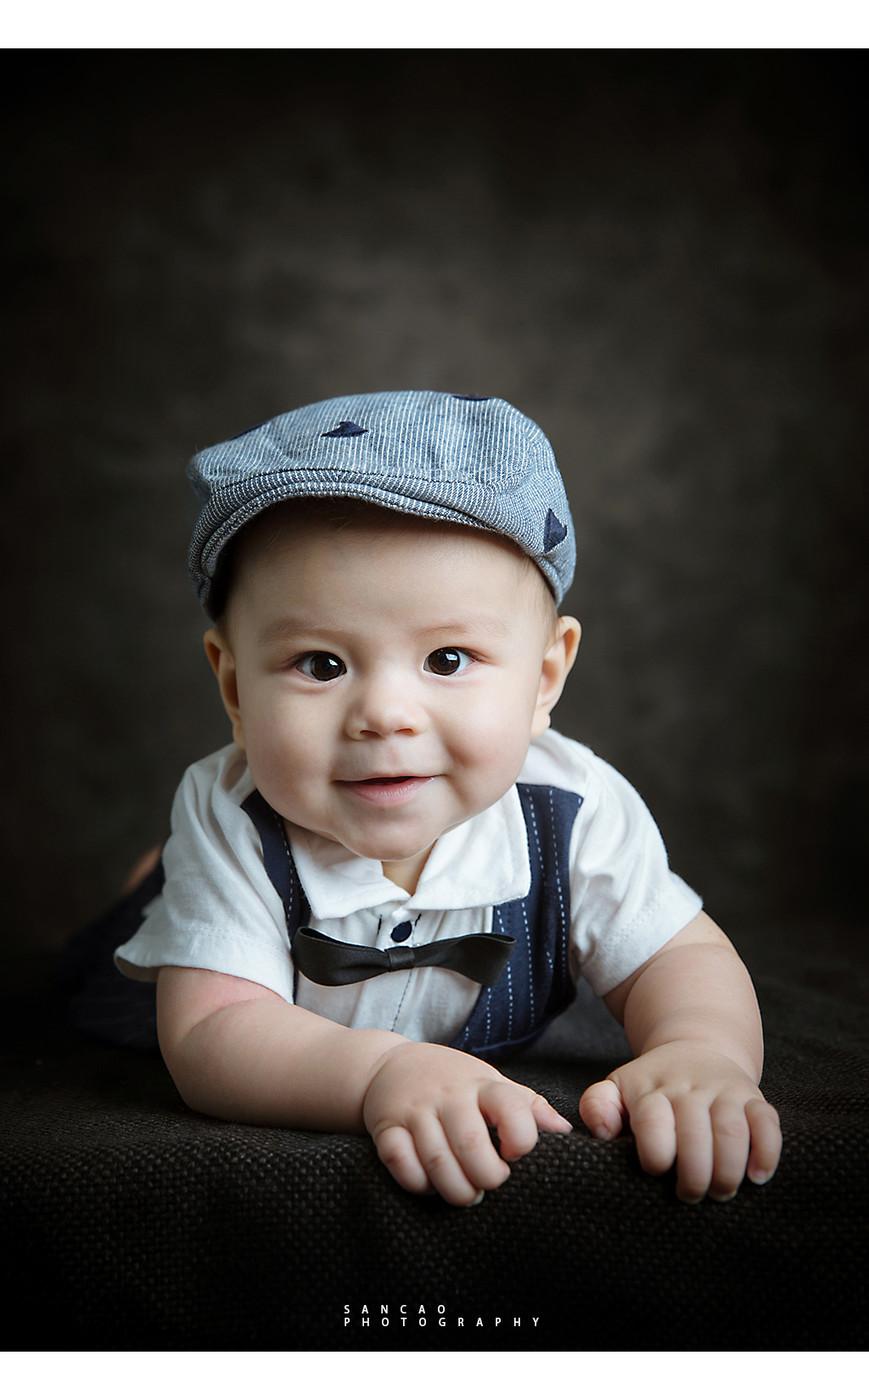 婴儿(0-6个月)18